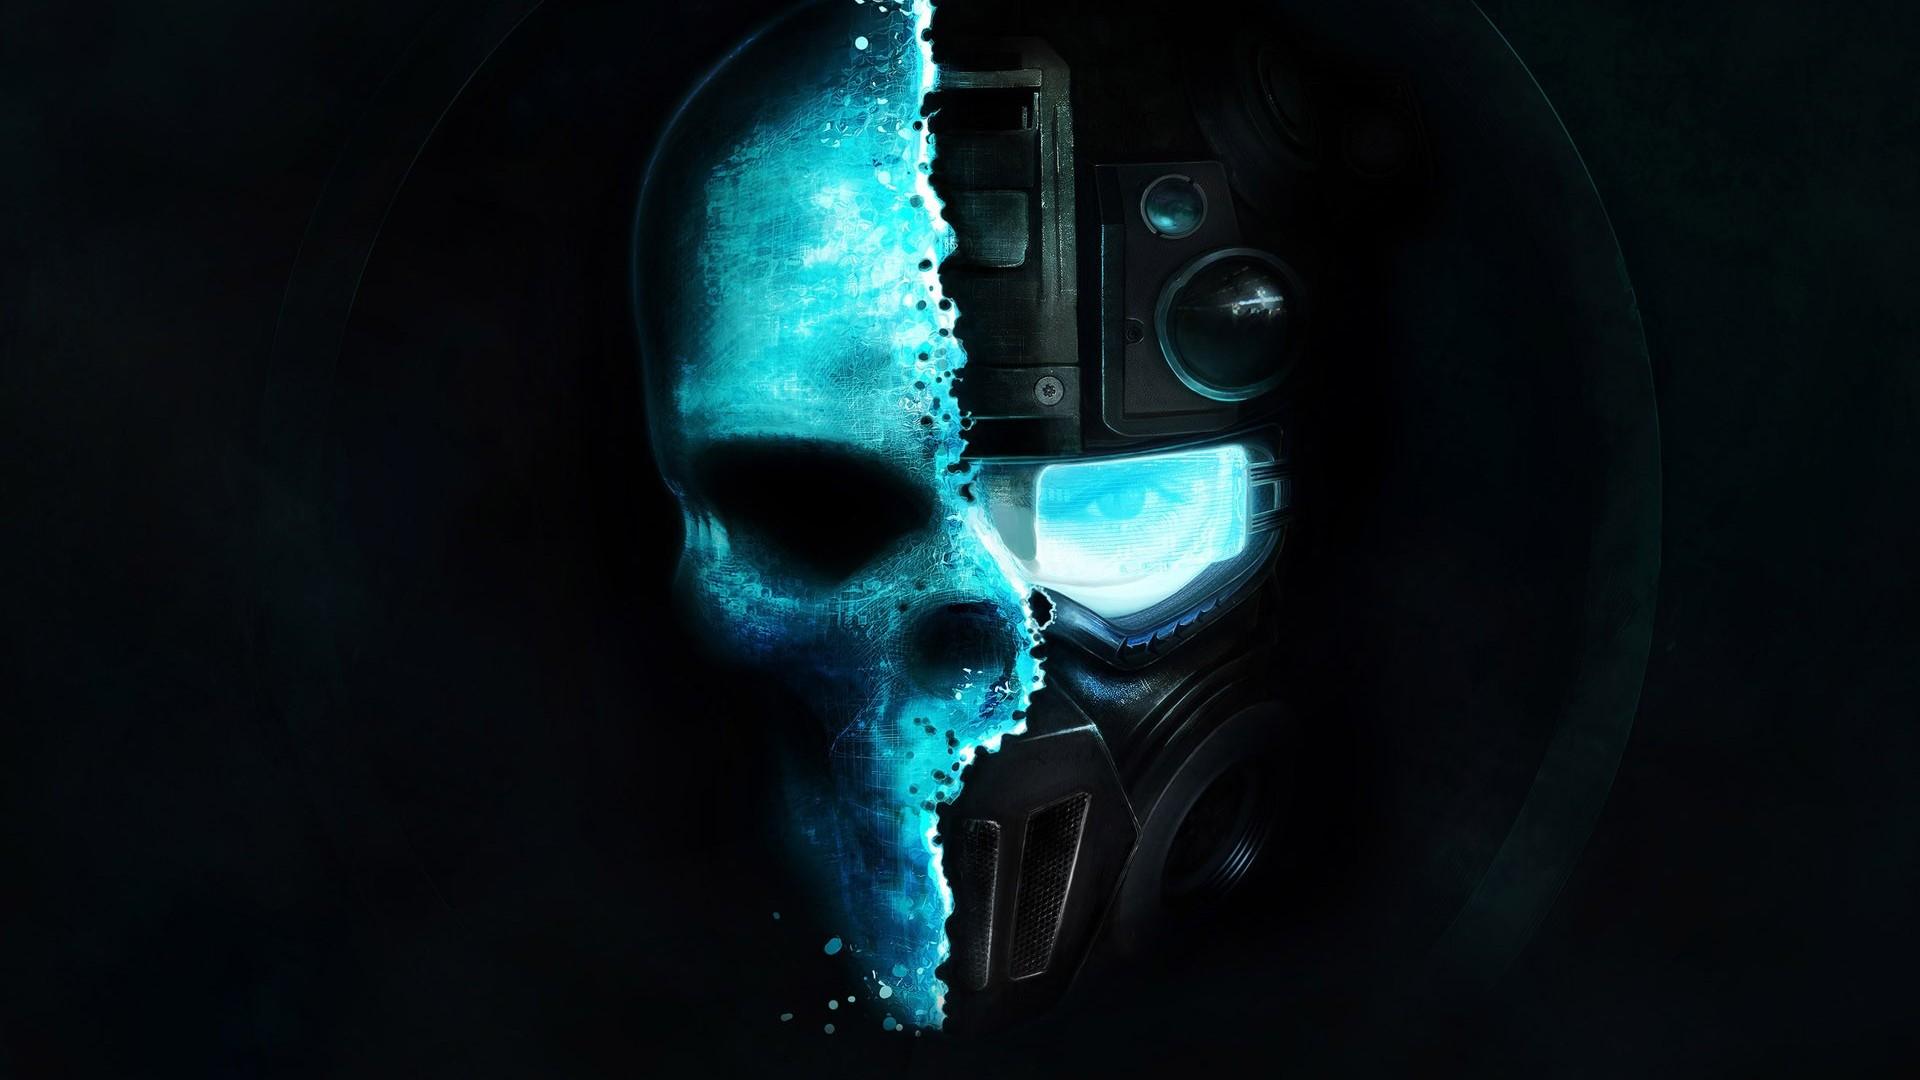 Overwatch Soldier 76 4K wallpaper